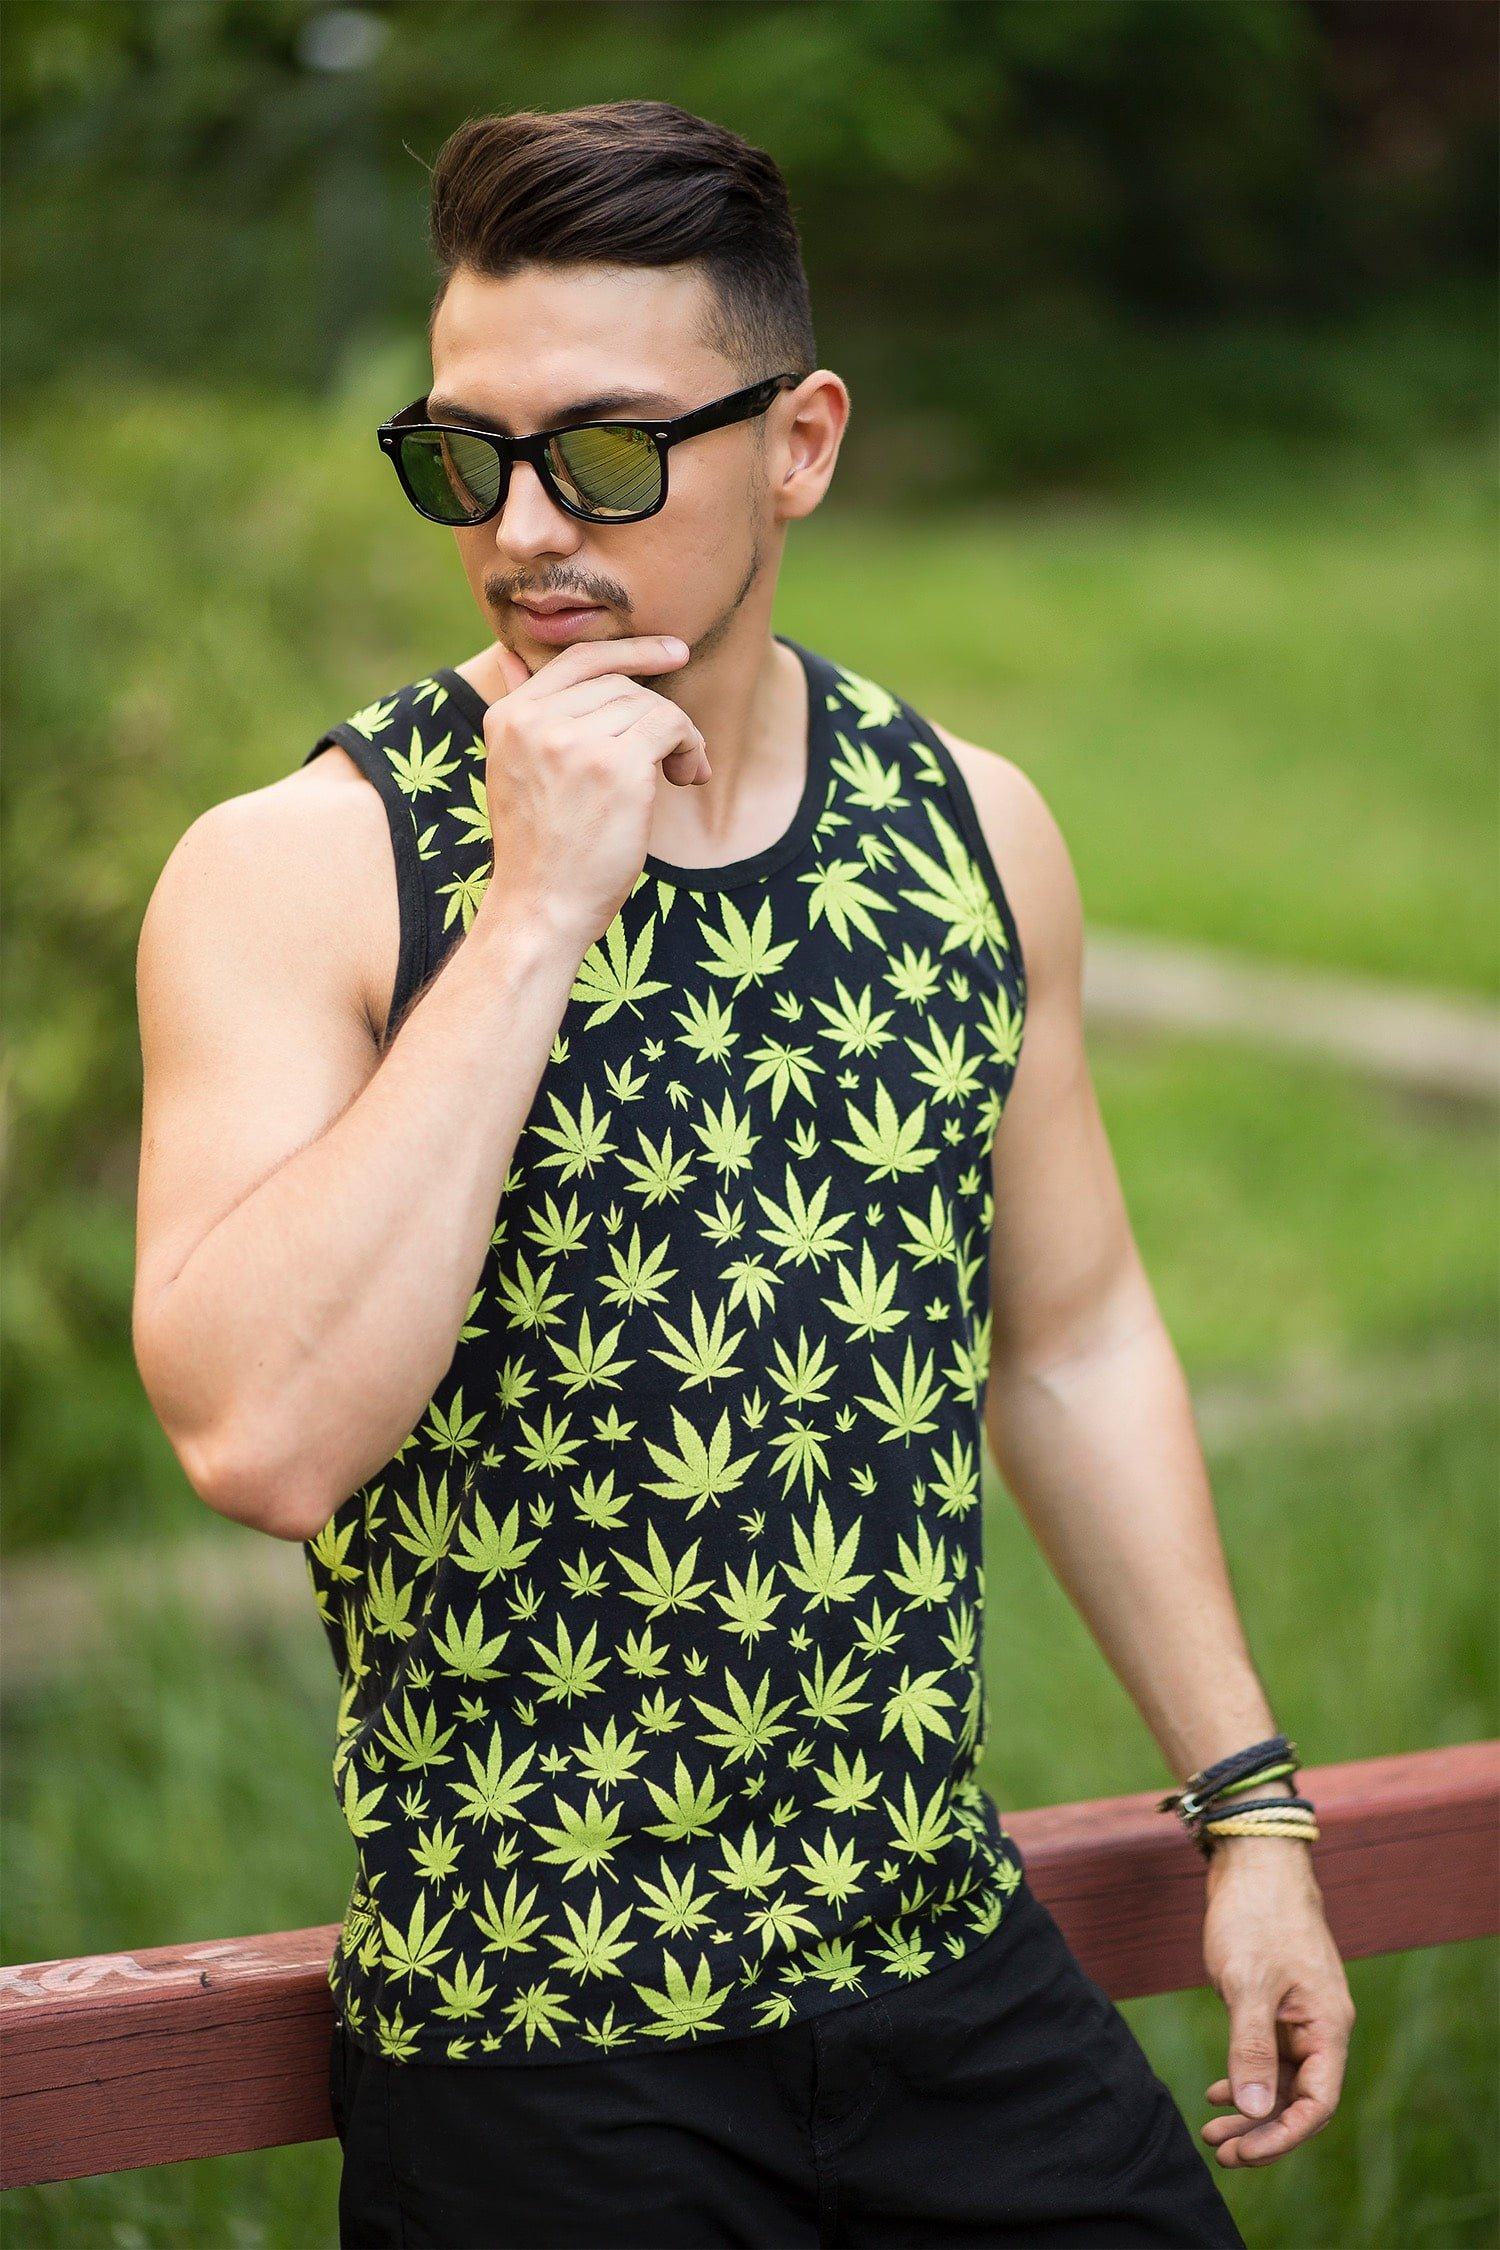 estilo hqsc cannabis juan alves 2